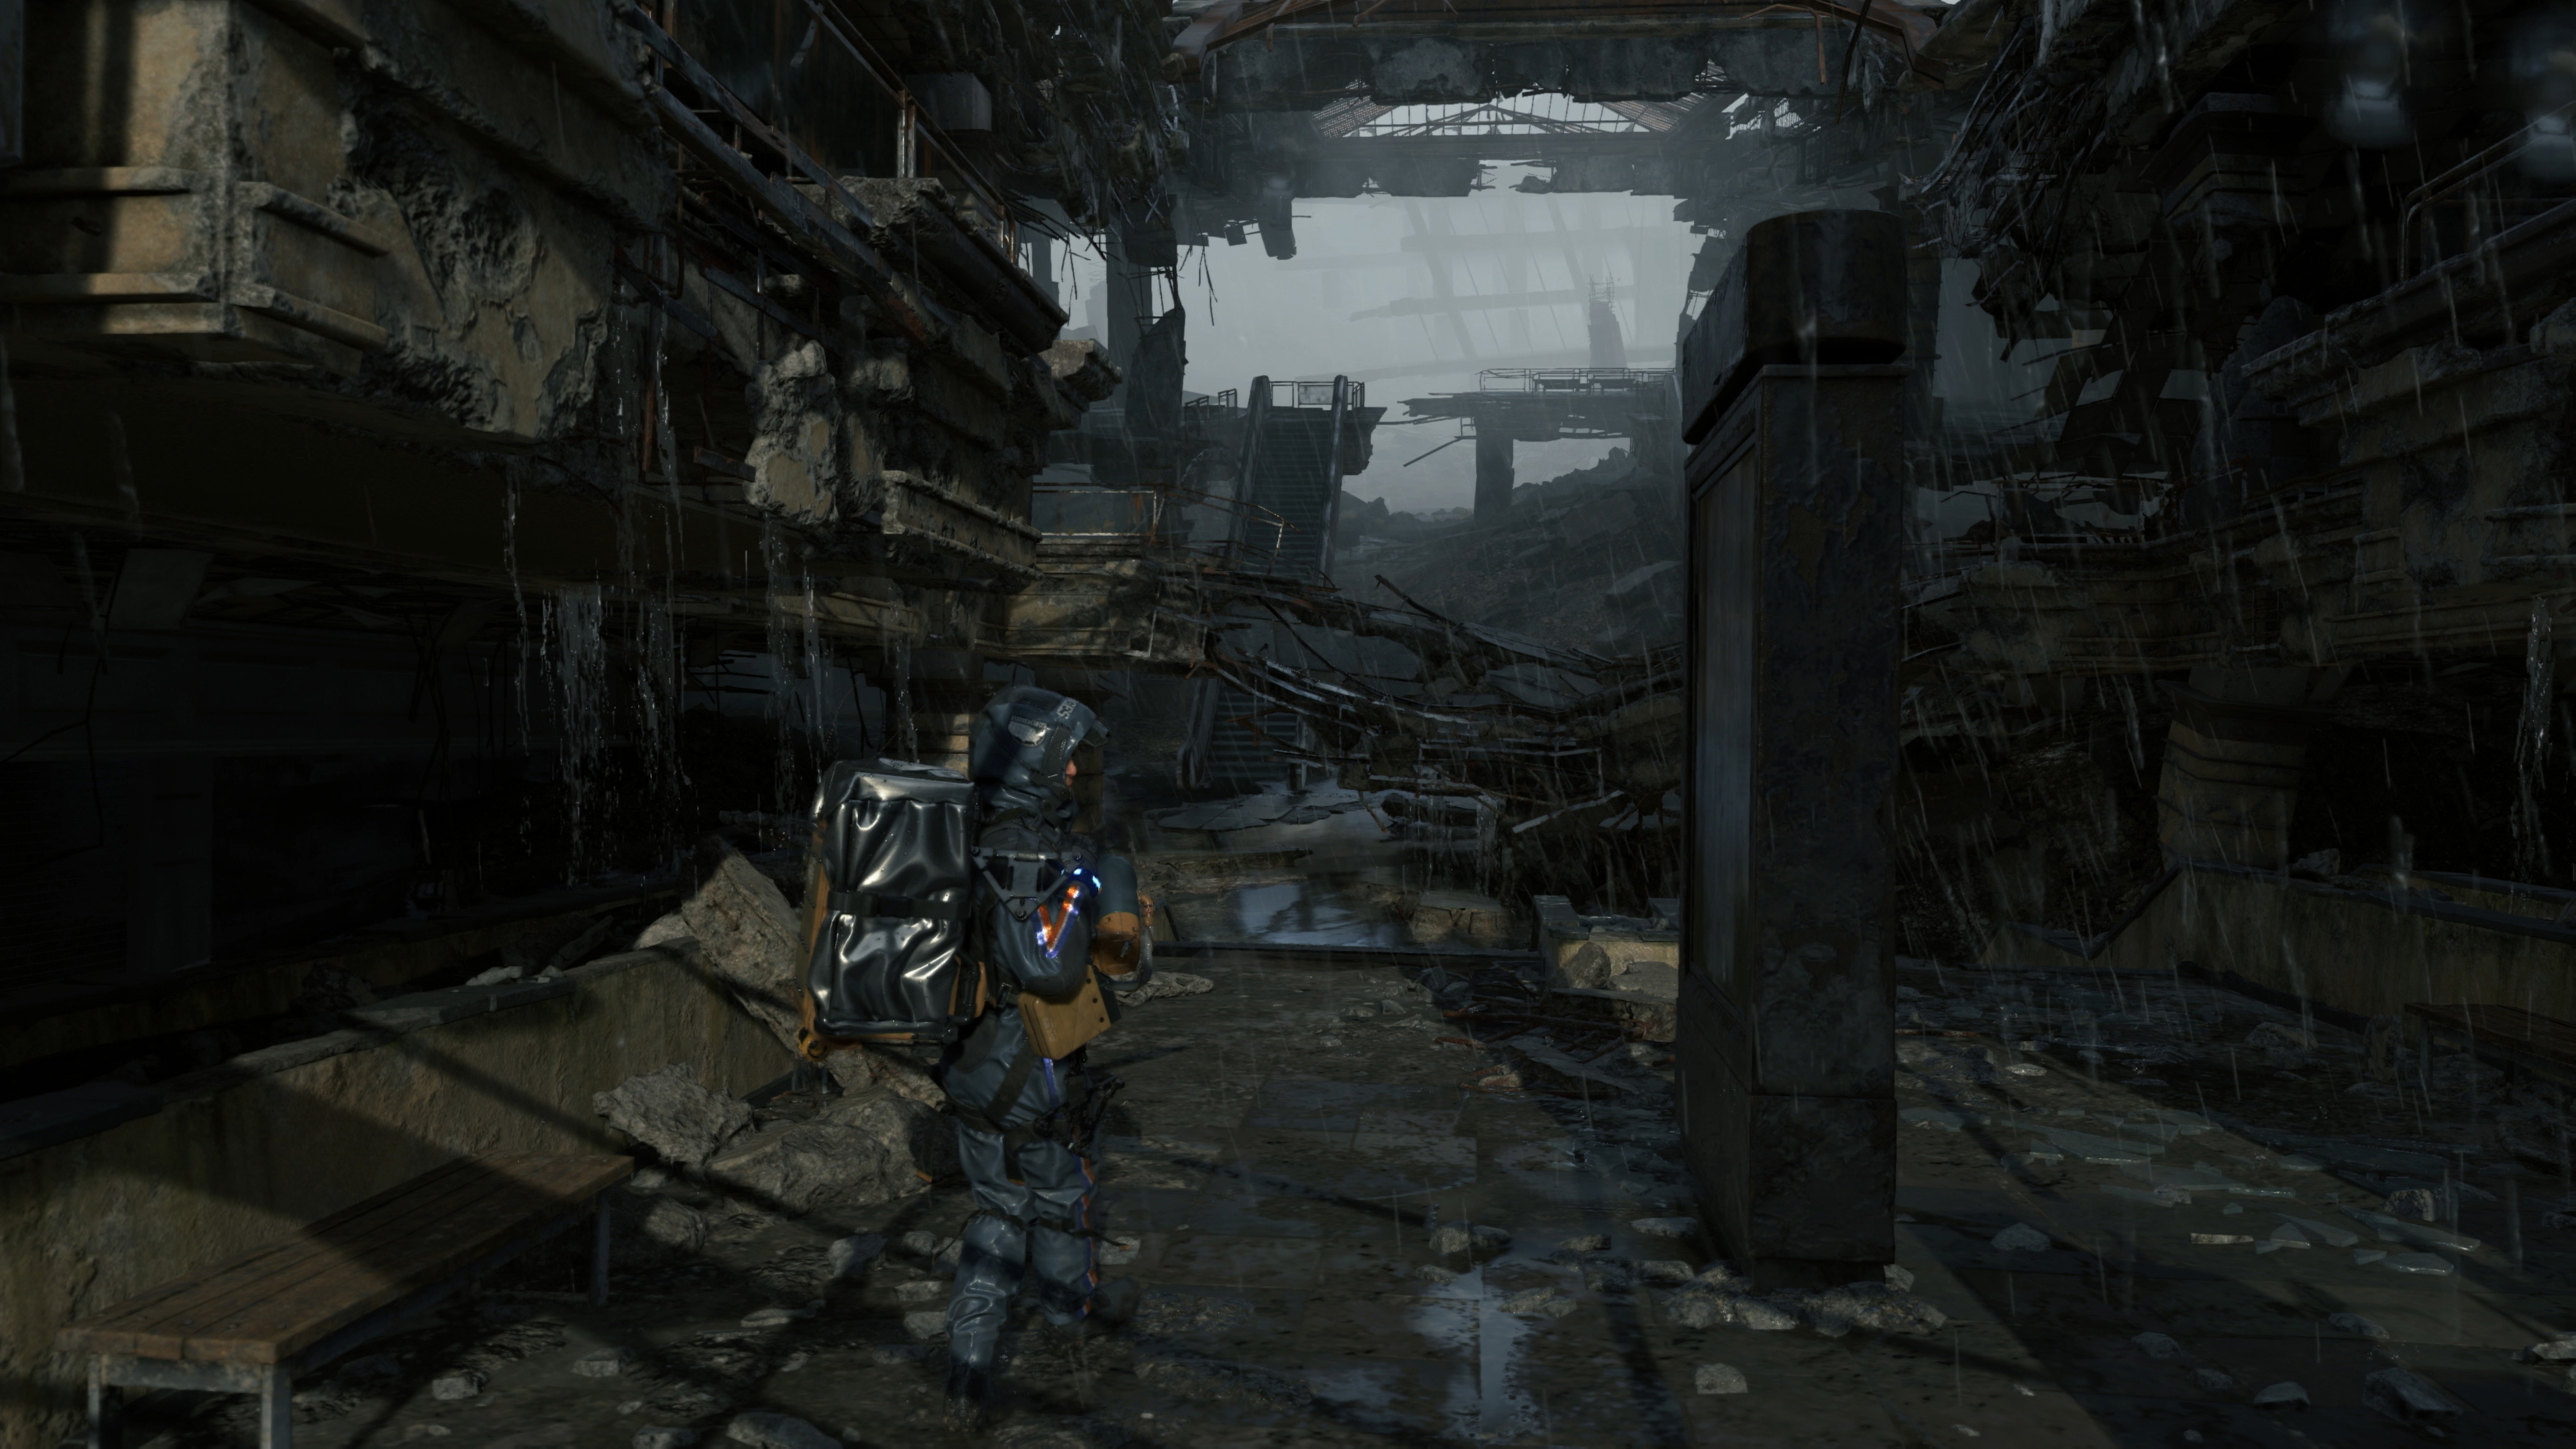 Gear Wallpaper Hd Here Is The E3 2018 Trailer For Death Stranding Metal